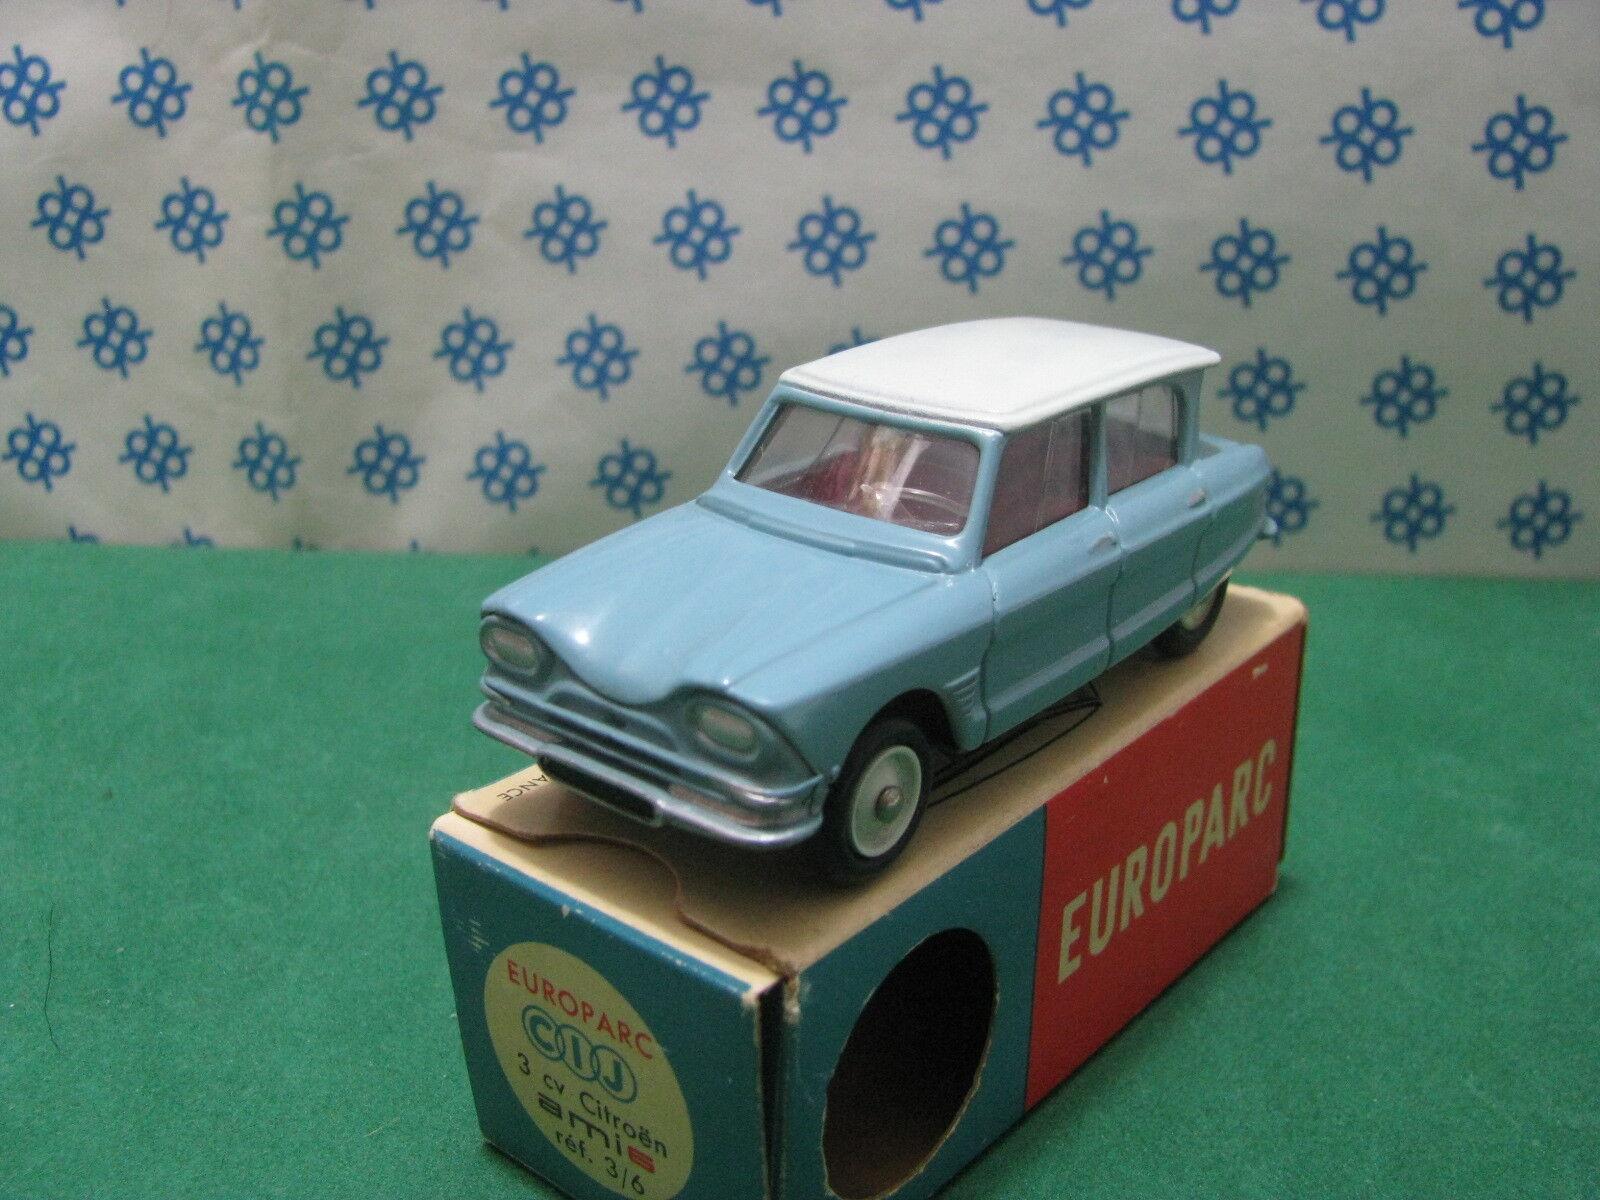 Vintage CIJ  Europarc 3 6  -  CITROEN  AMI 3 Cv.   -  France   Superbe  MIB